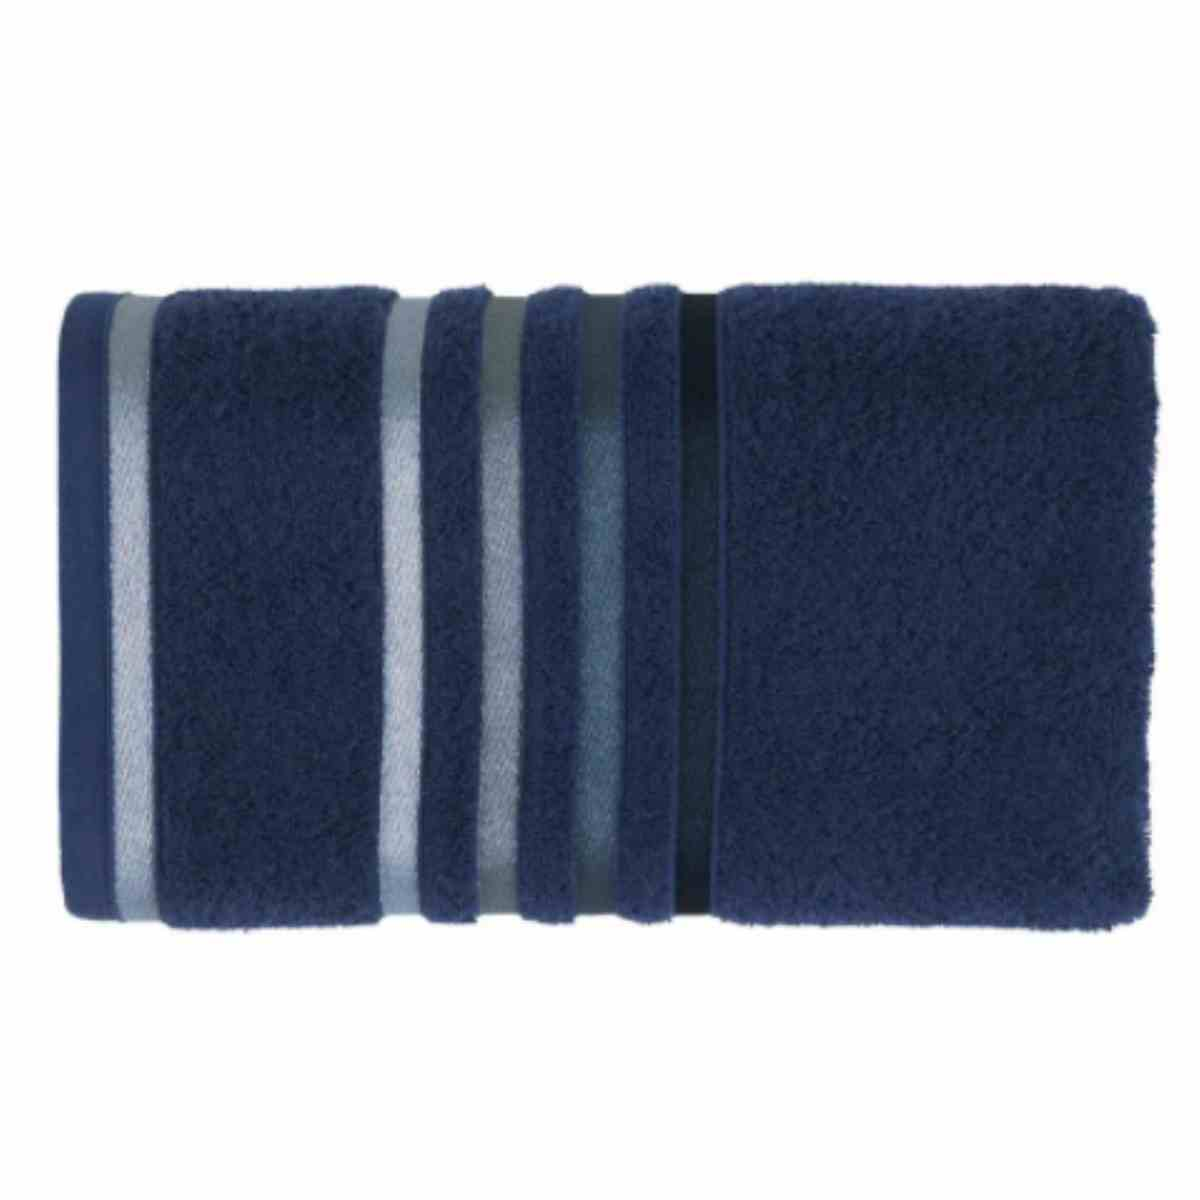 Toalha de Banho Lumina 70x140 Marinho/Azul